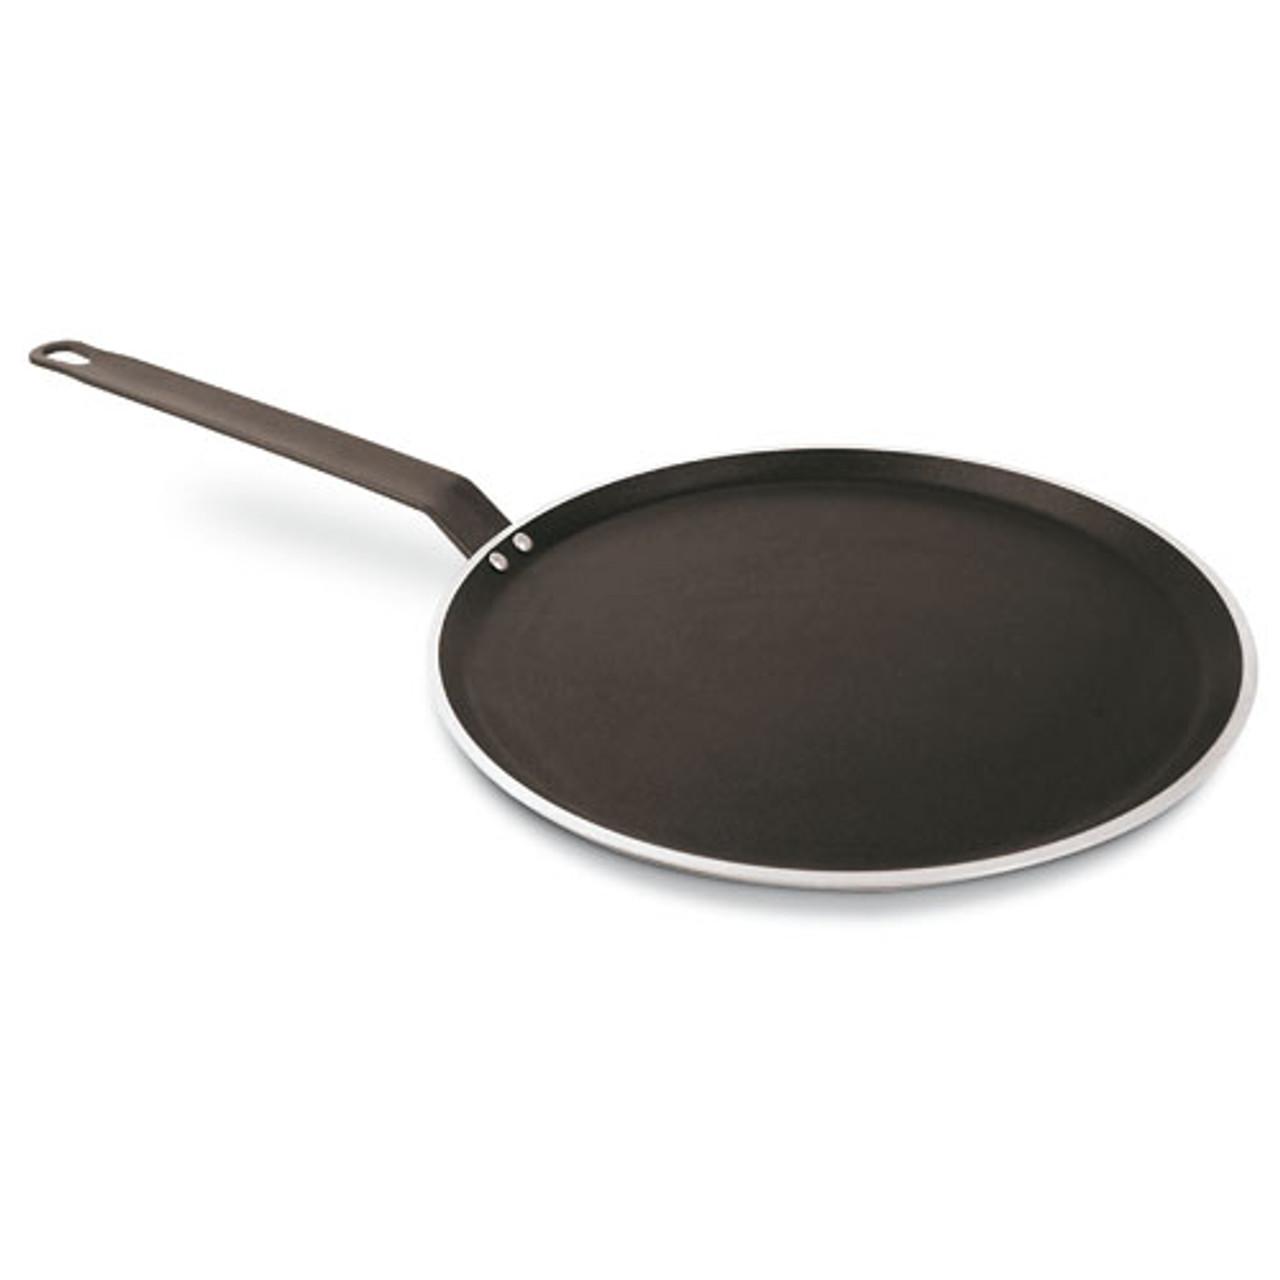 "Non Stick Crepe Pan, DIA 11 7/8"" X H 5/8"", 1.8 LBS"